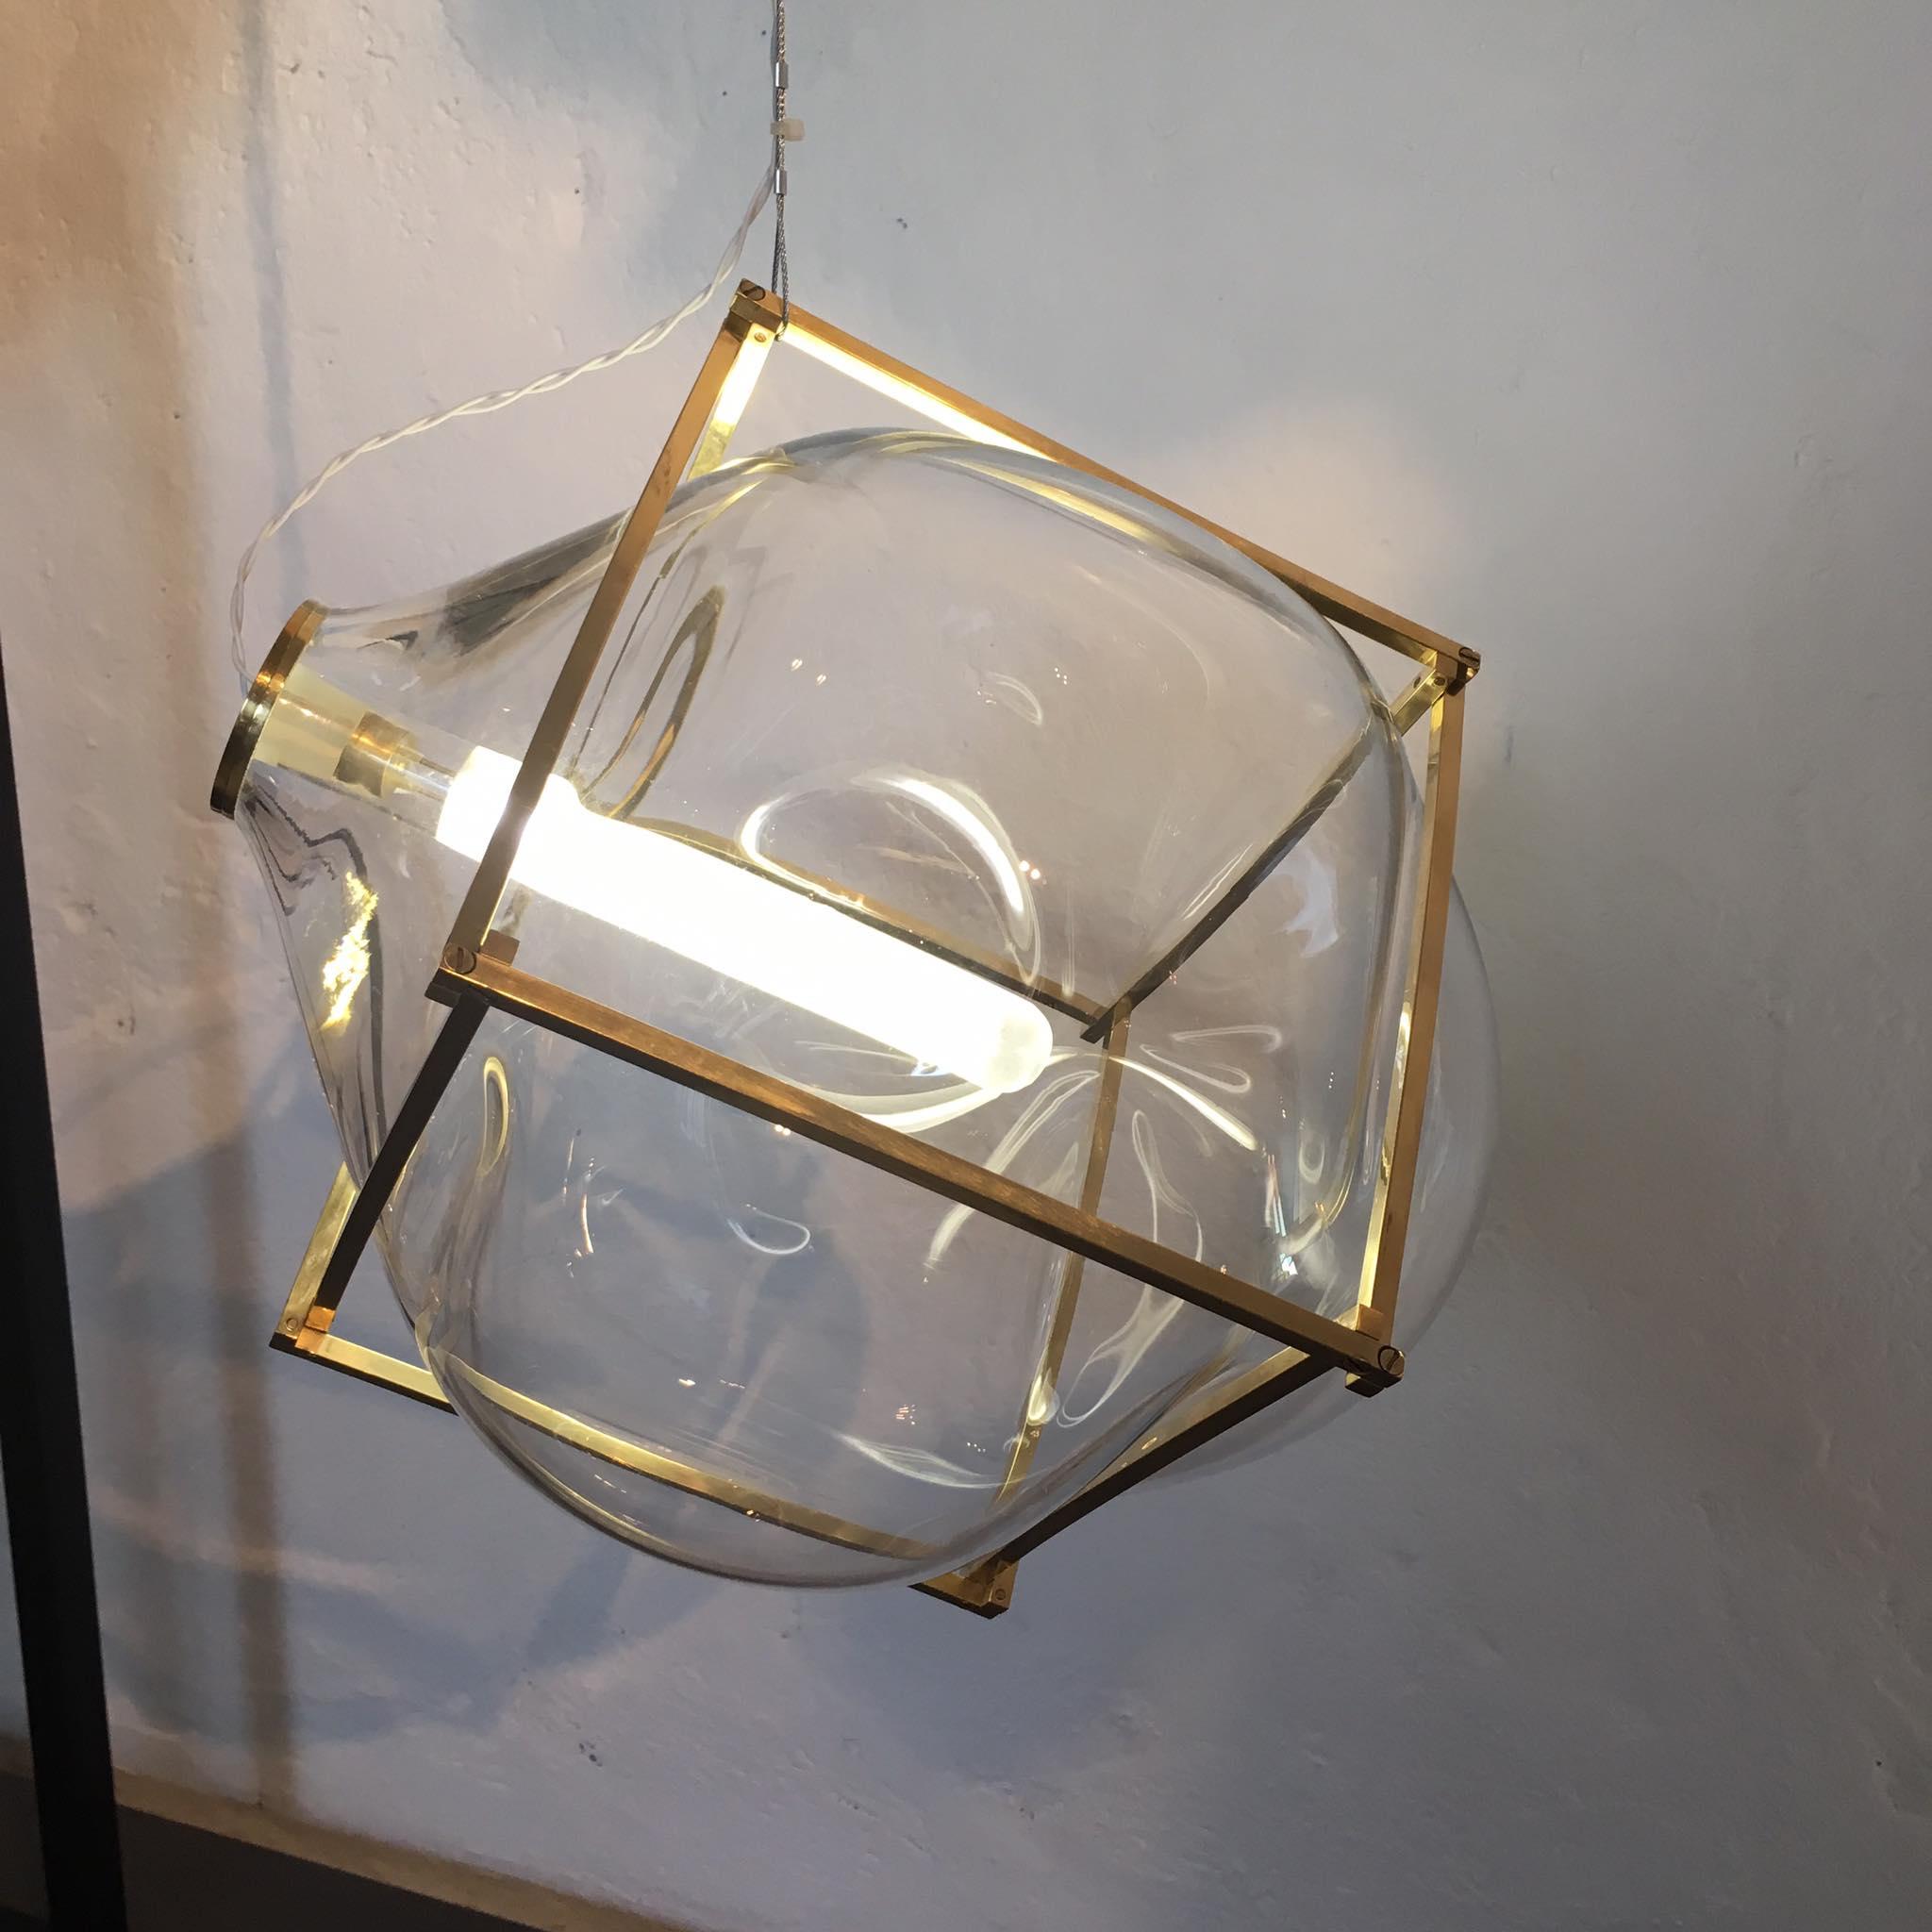 Thier Vandaalen Lamp Glas Organic Milaan Foto Gimmii Shop